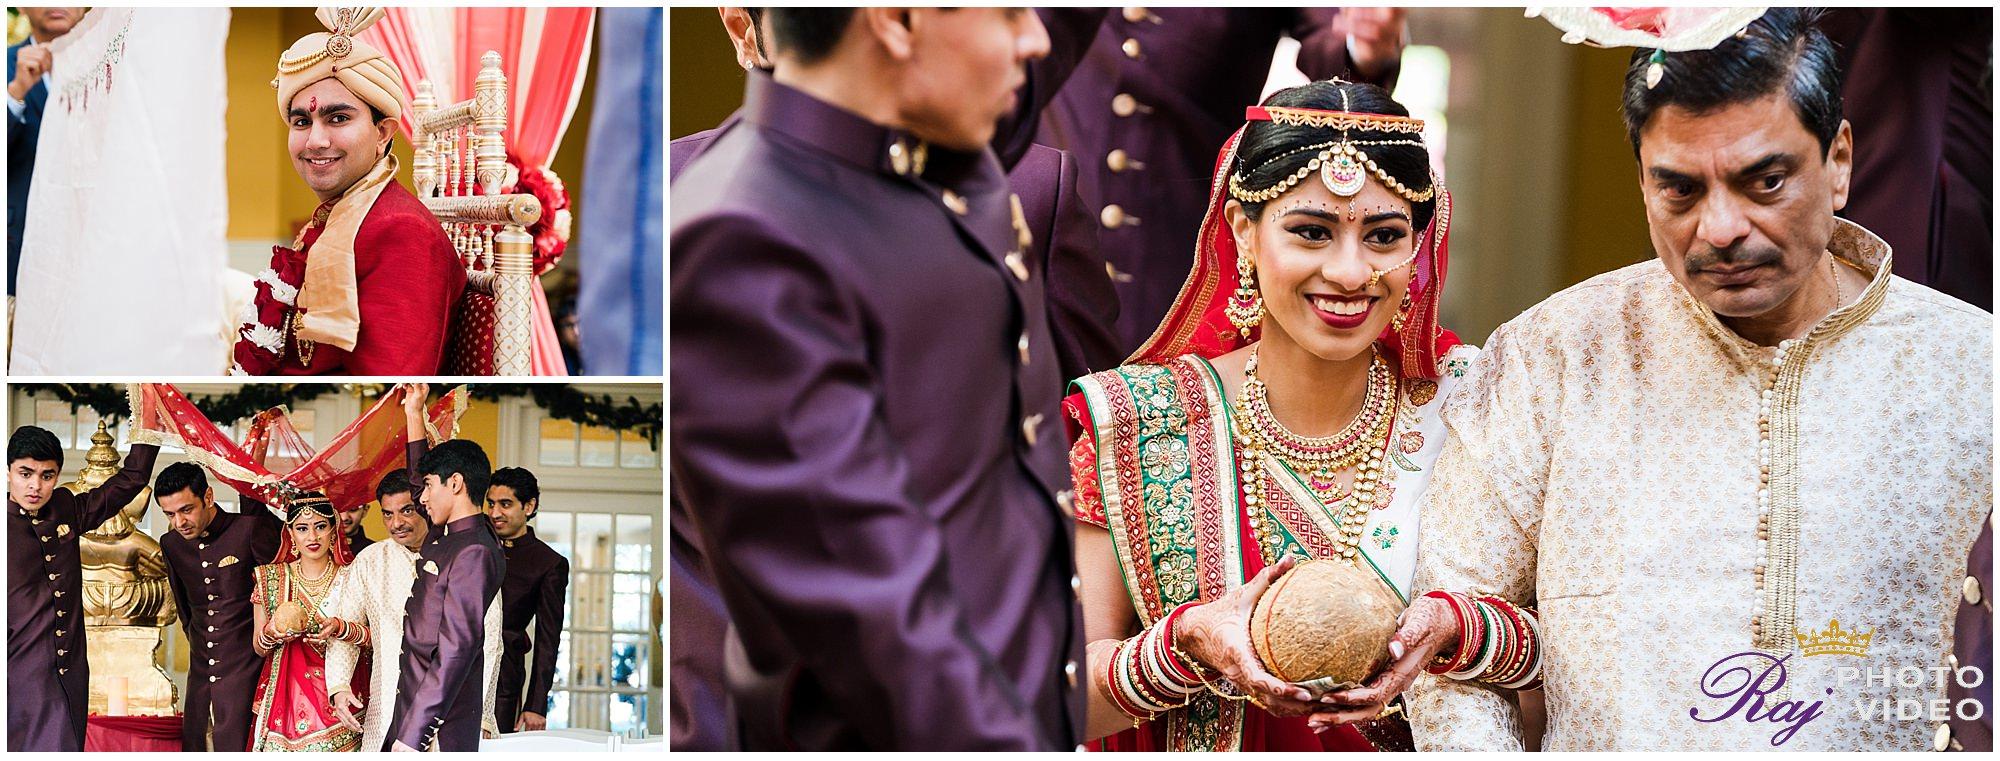 Founders-Inn-and-Spa-Virginia-Beach-VA-Indian-Wedding-Harini-Vivek-34.jpg